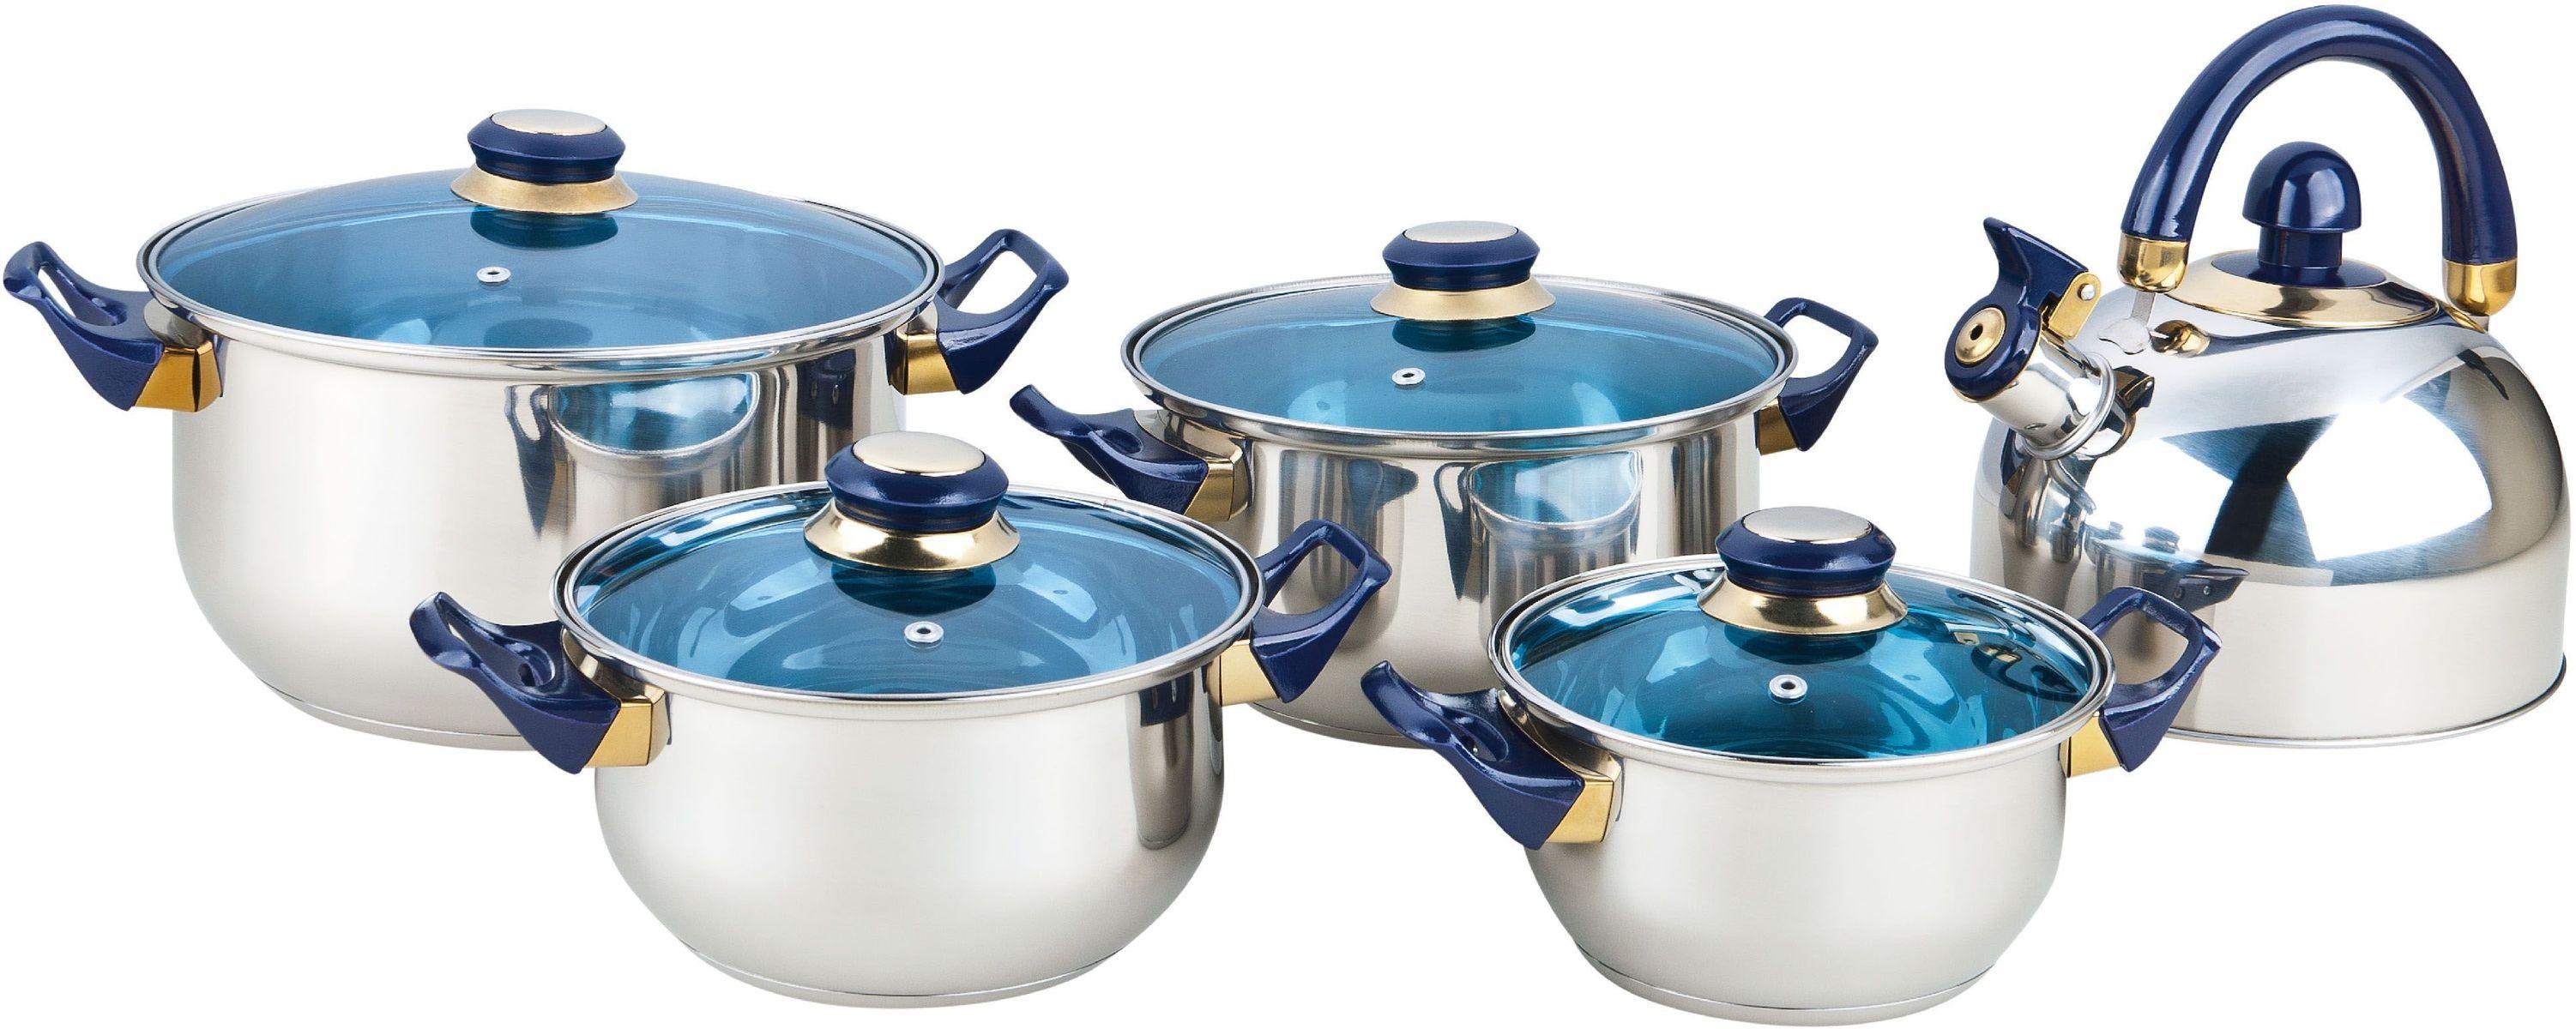 Набор посуды Bekker Classic, 9 предметов. BK-4605 набор посуды bekker classic 9 предметов bk 4605